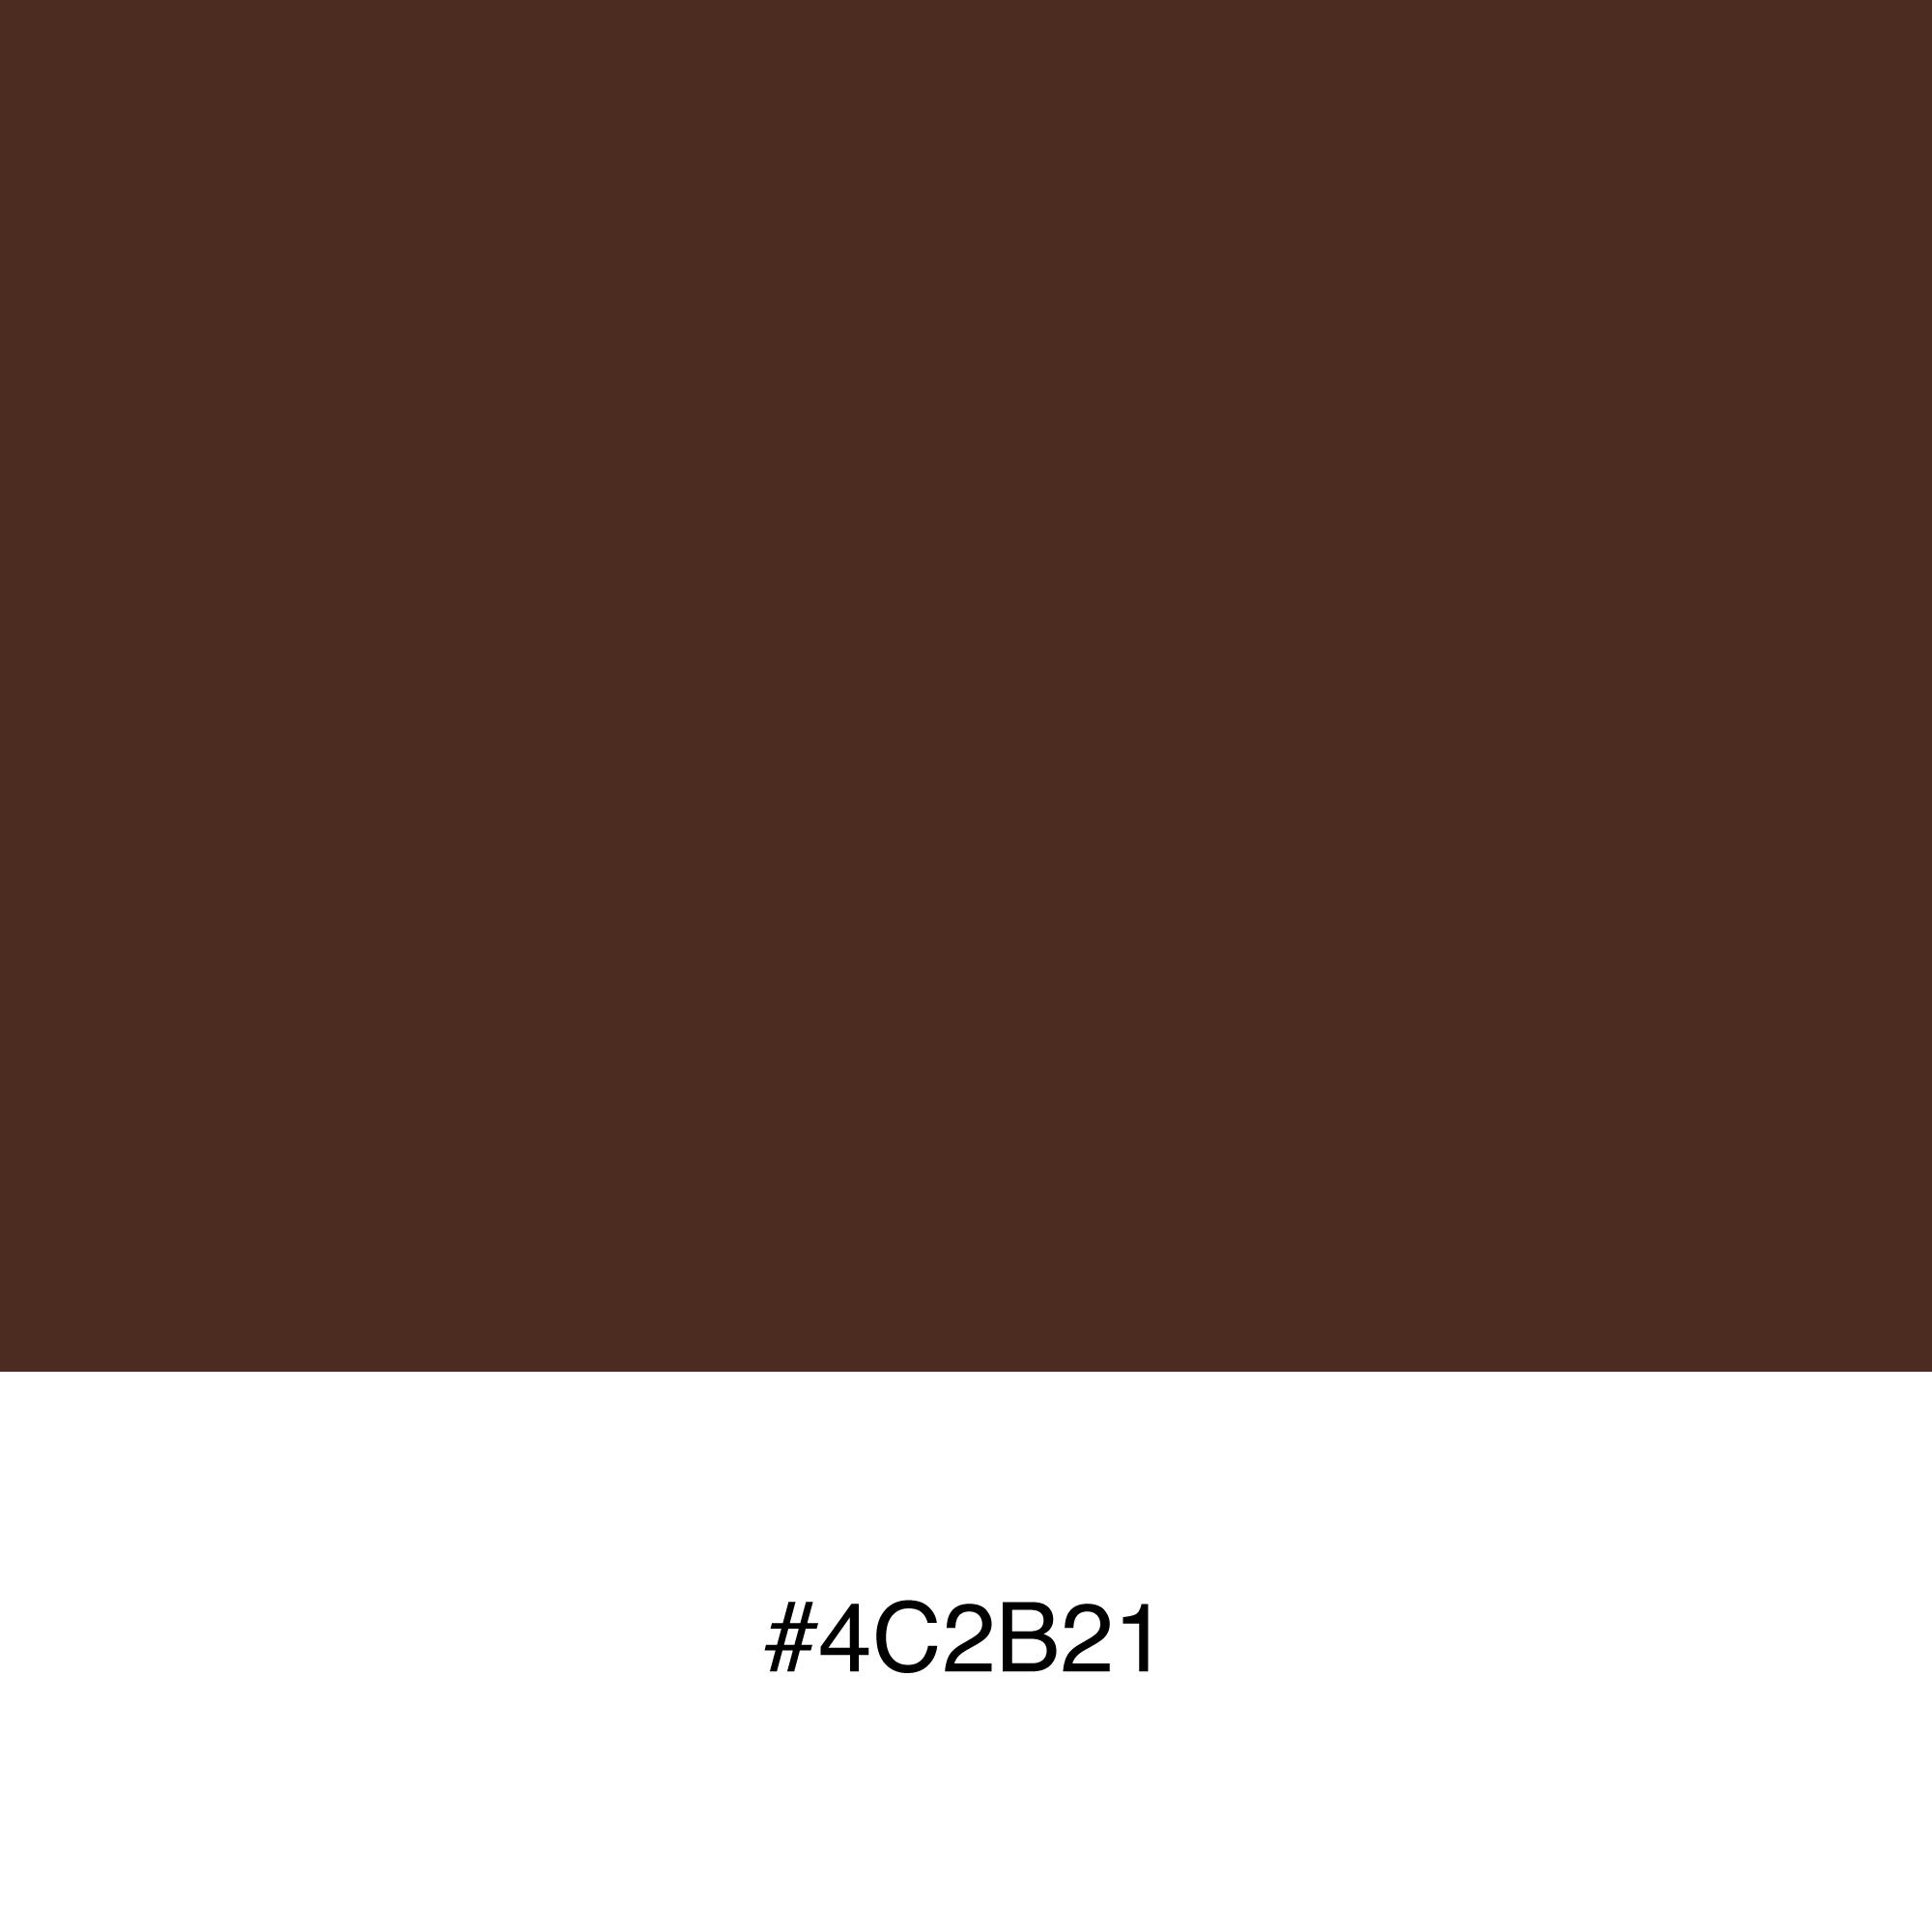 color-swatch-4c2b21